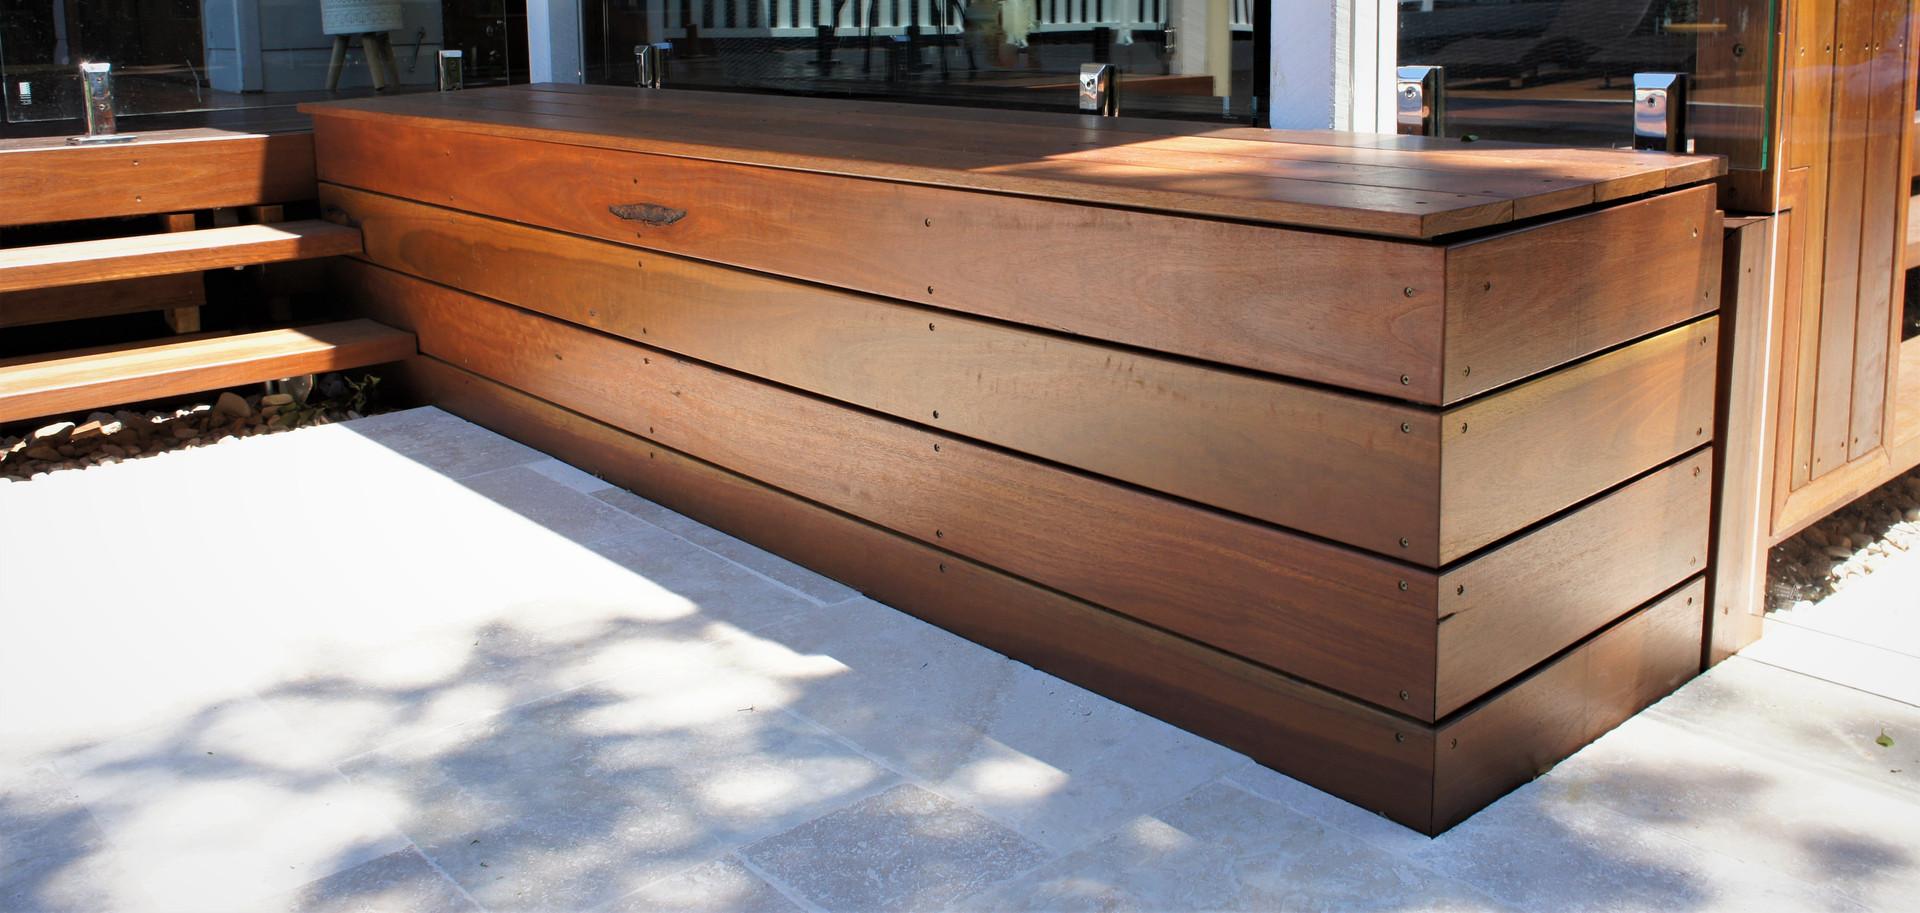 Deck seat box